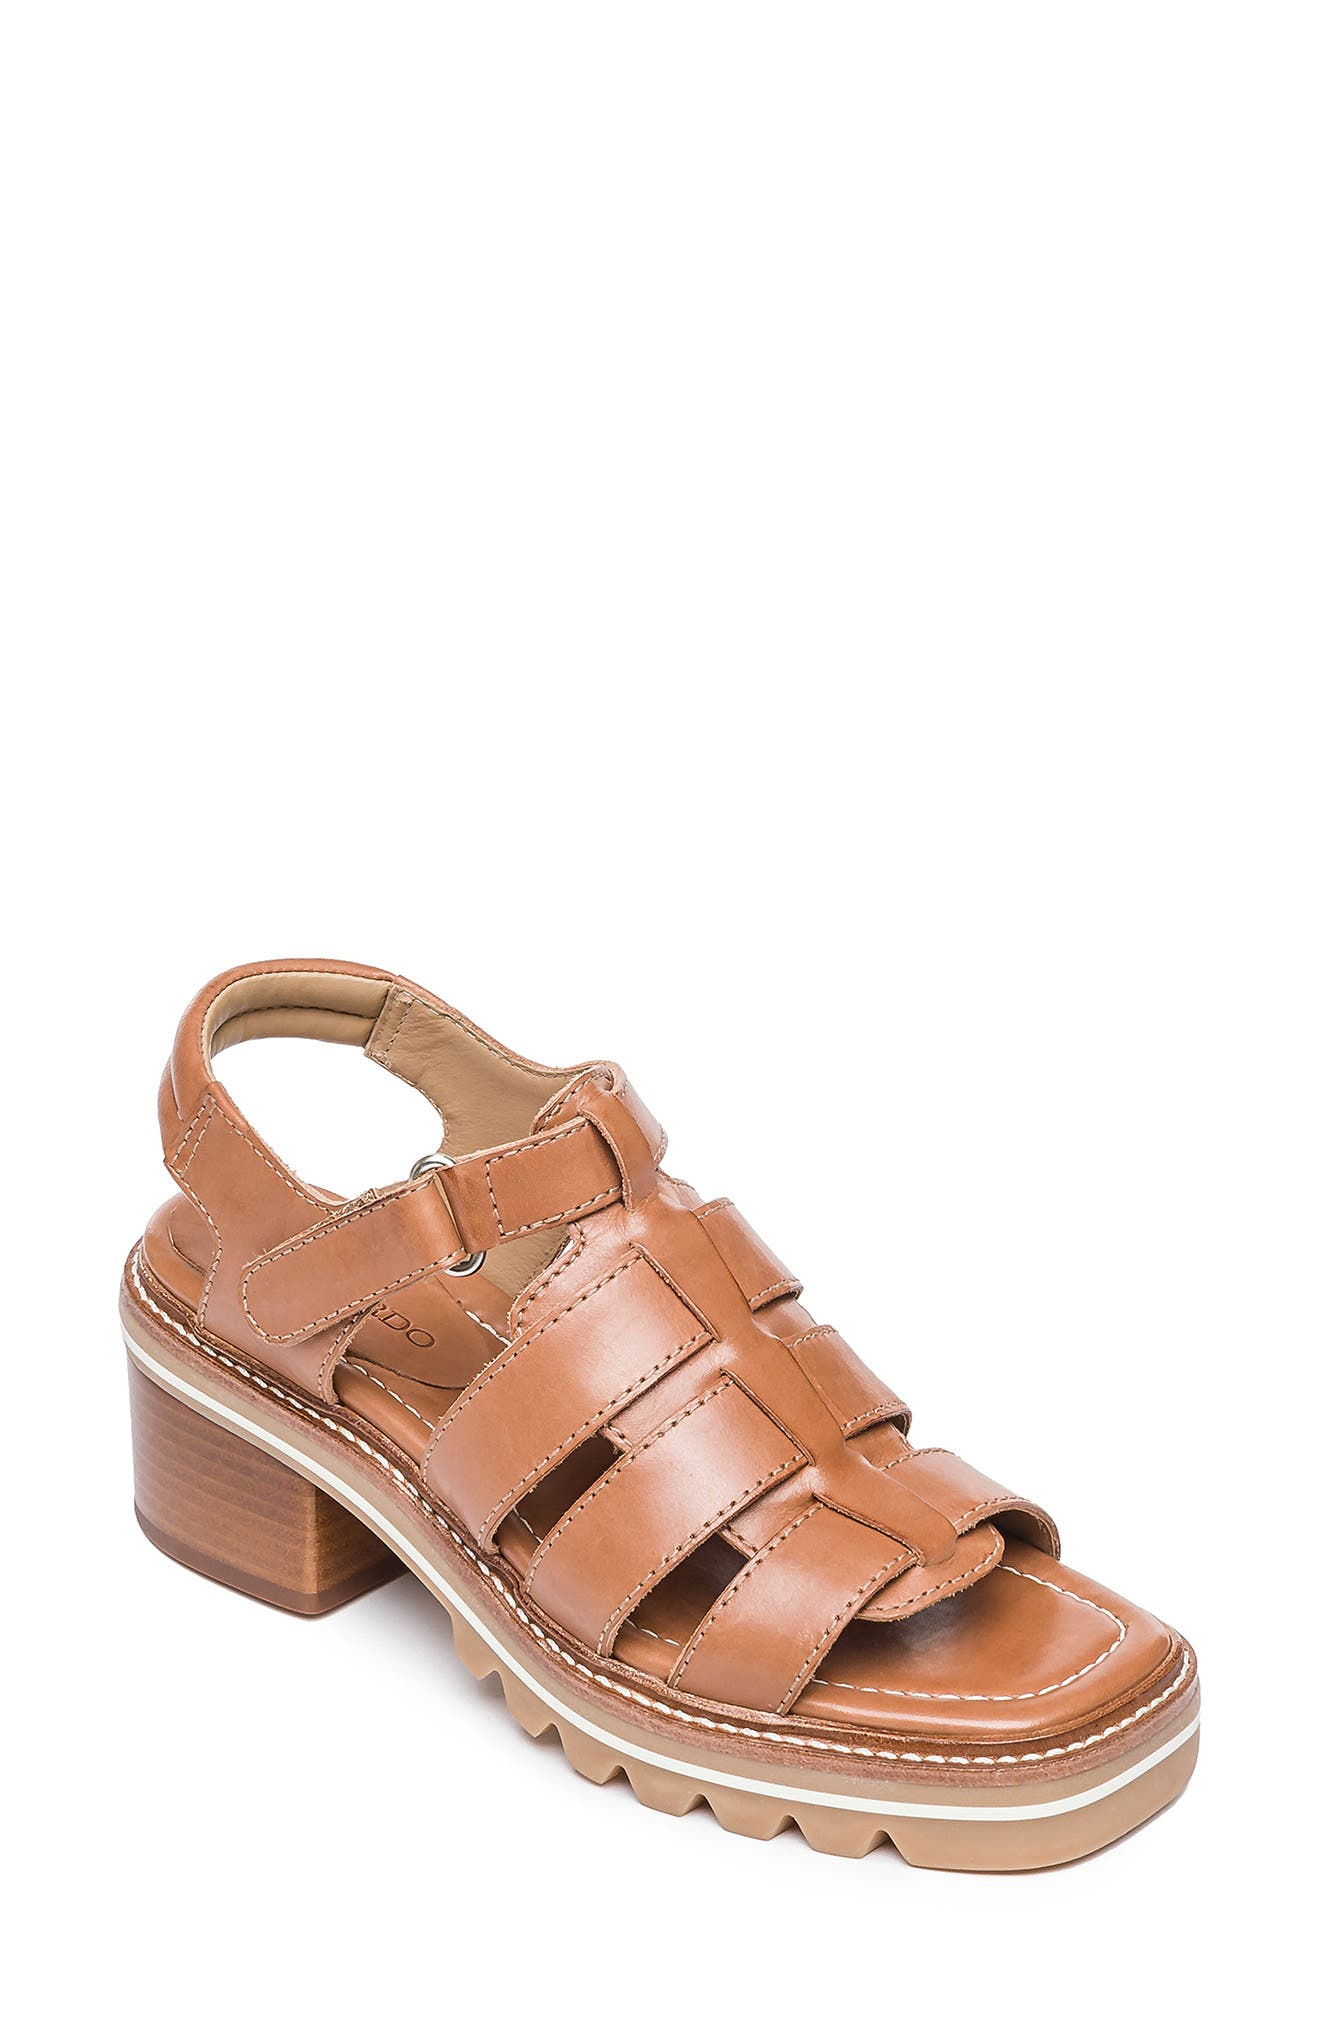 Sasha Strappy Sandal